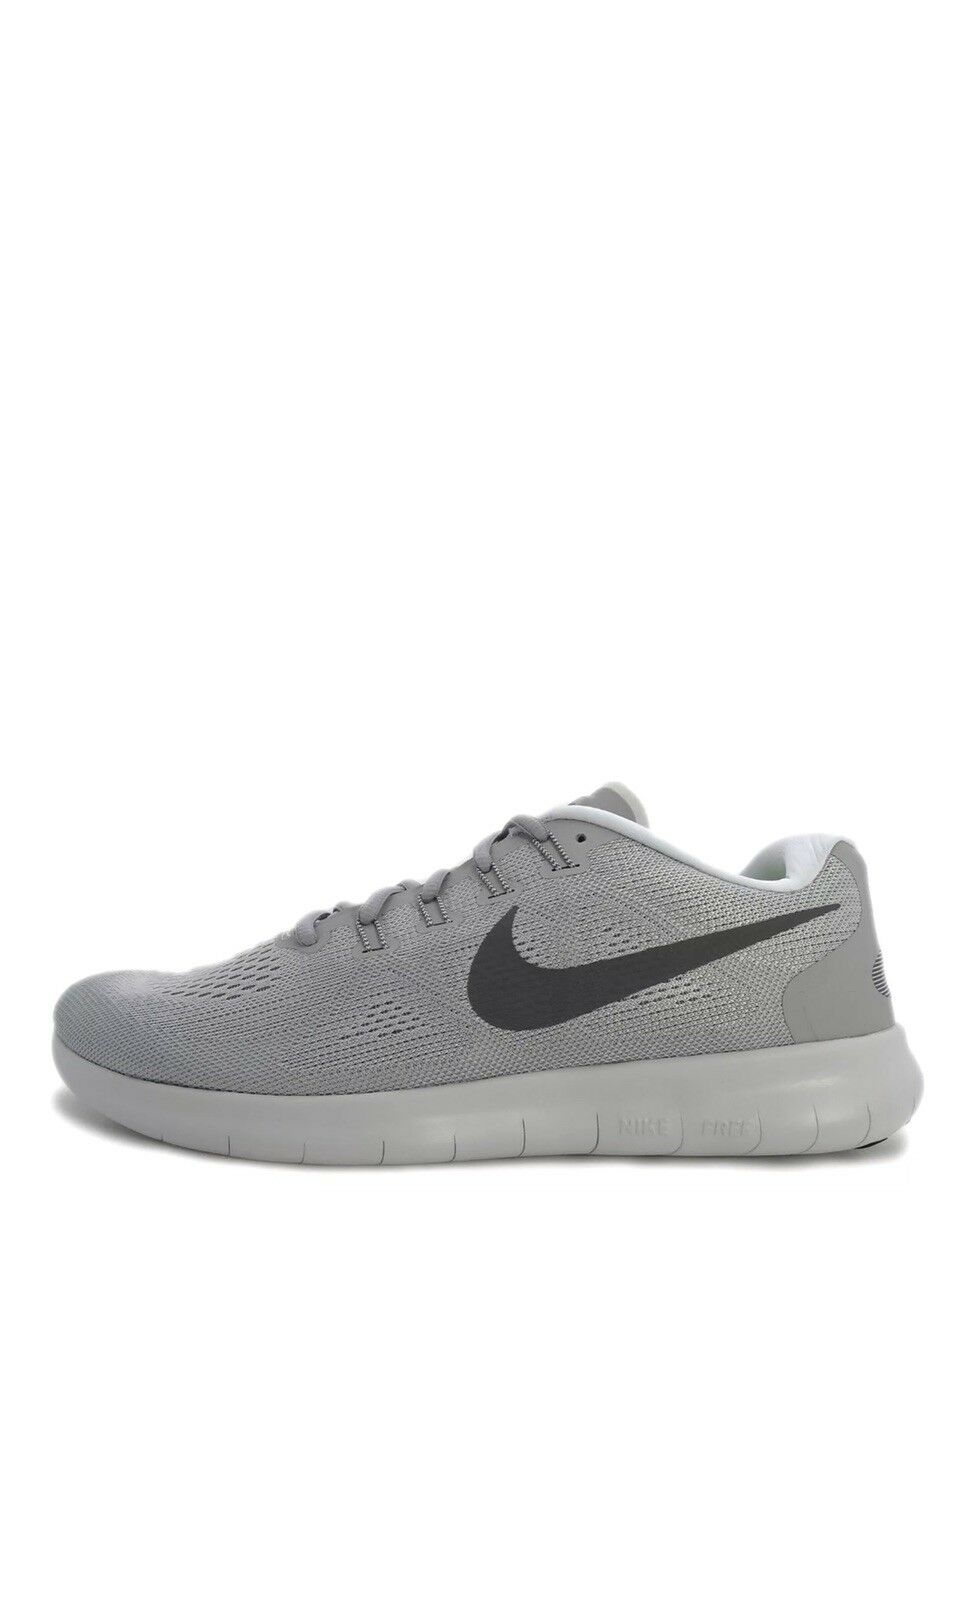 Nike free rn 2017 mens Size 11.5